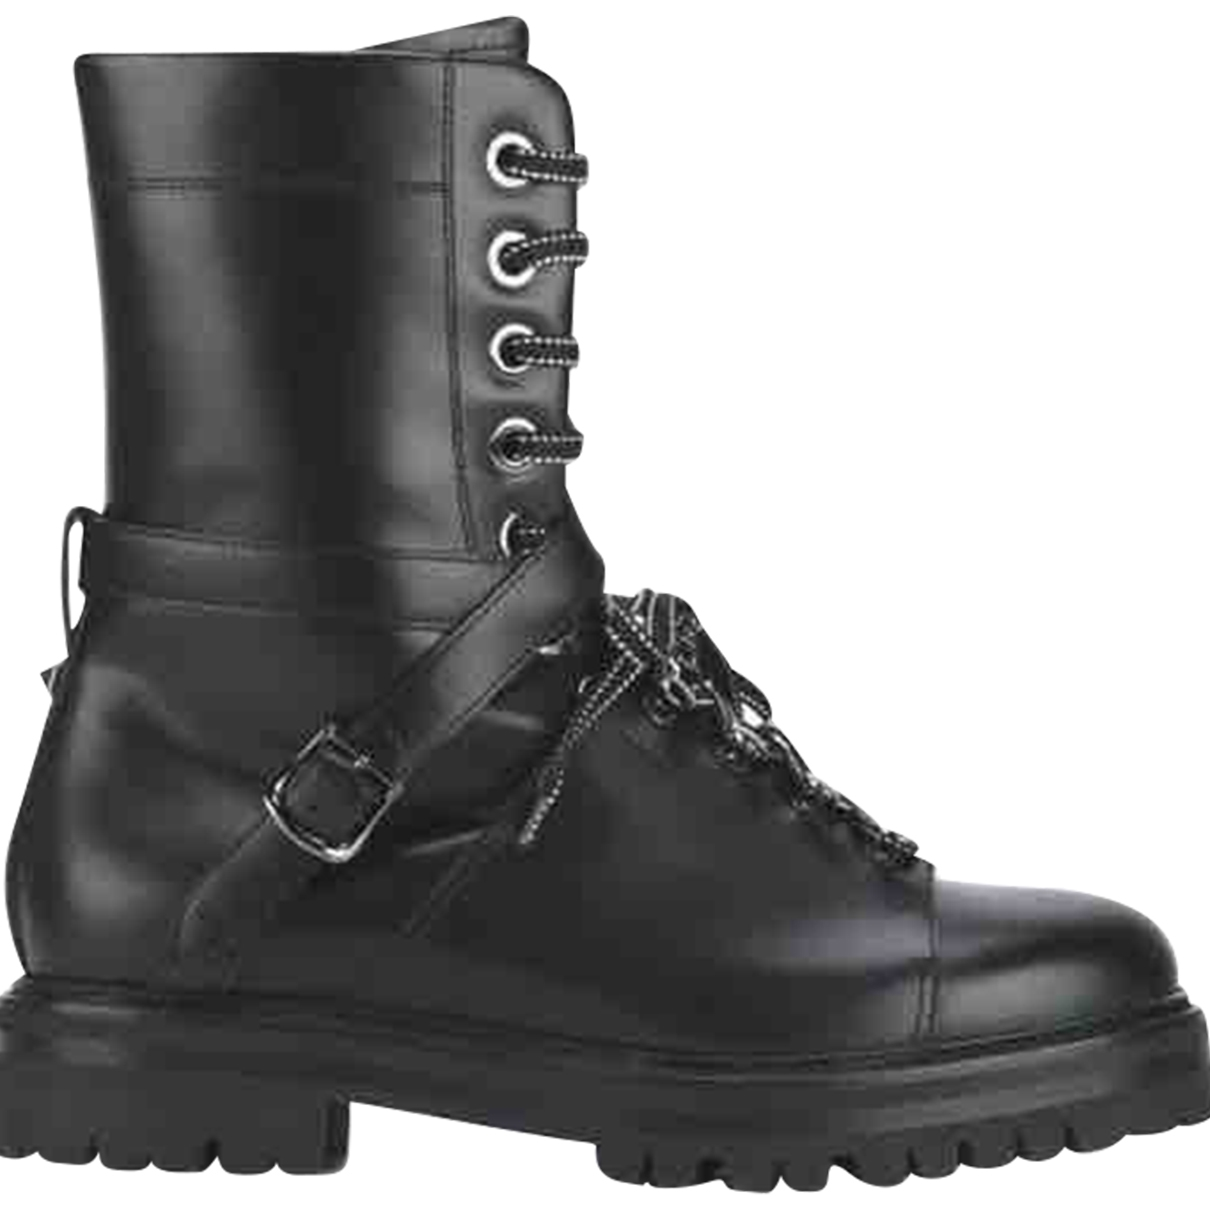 Valentino Garavani Rockstud Black Fur Boots for Women 39 EU